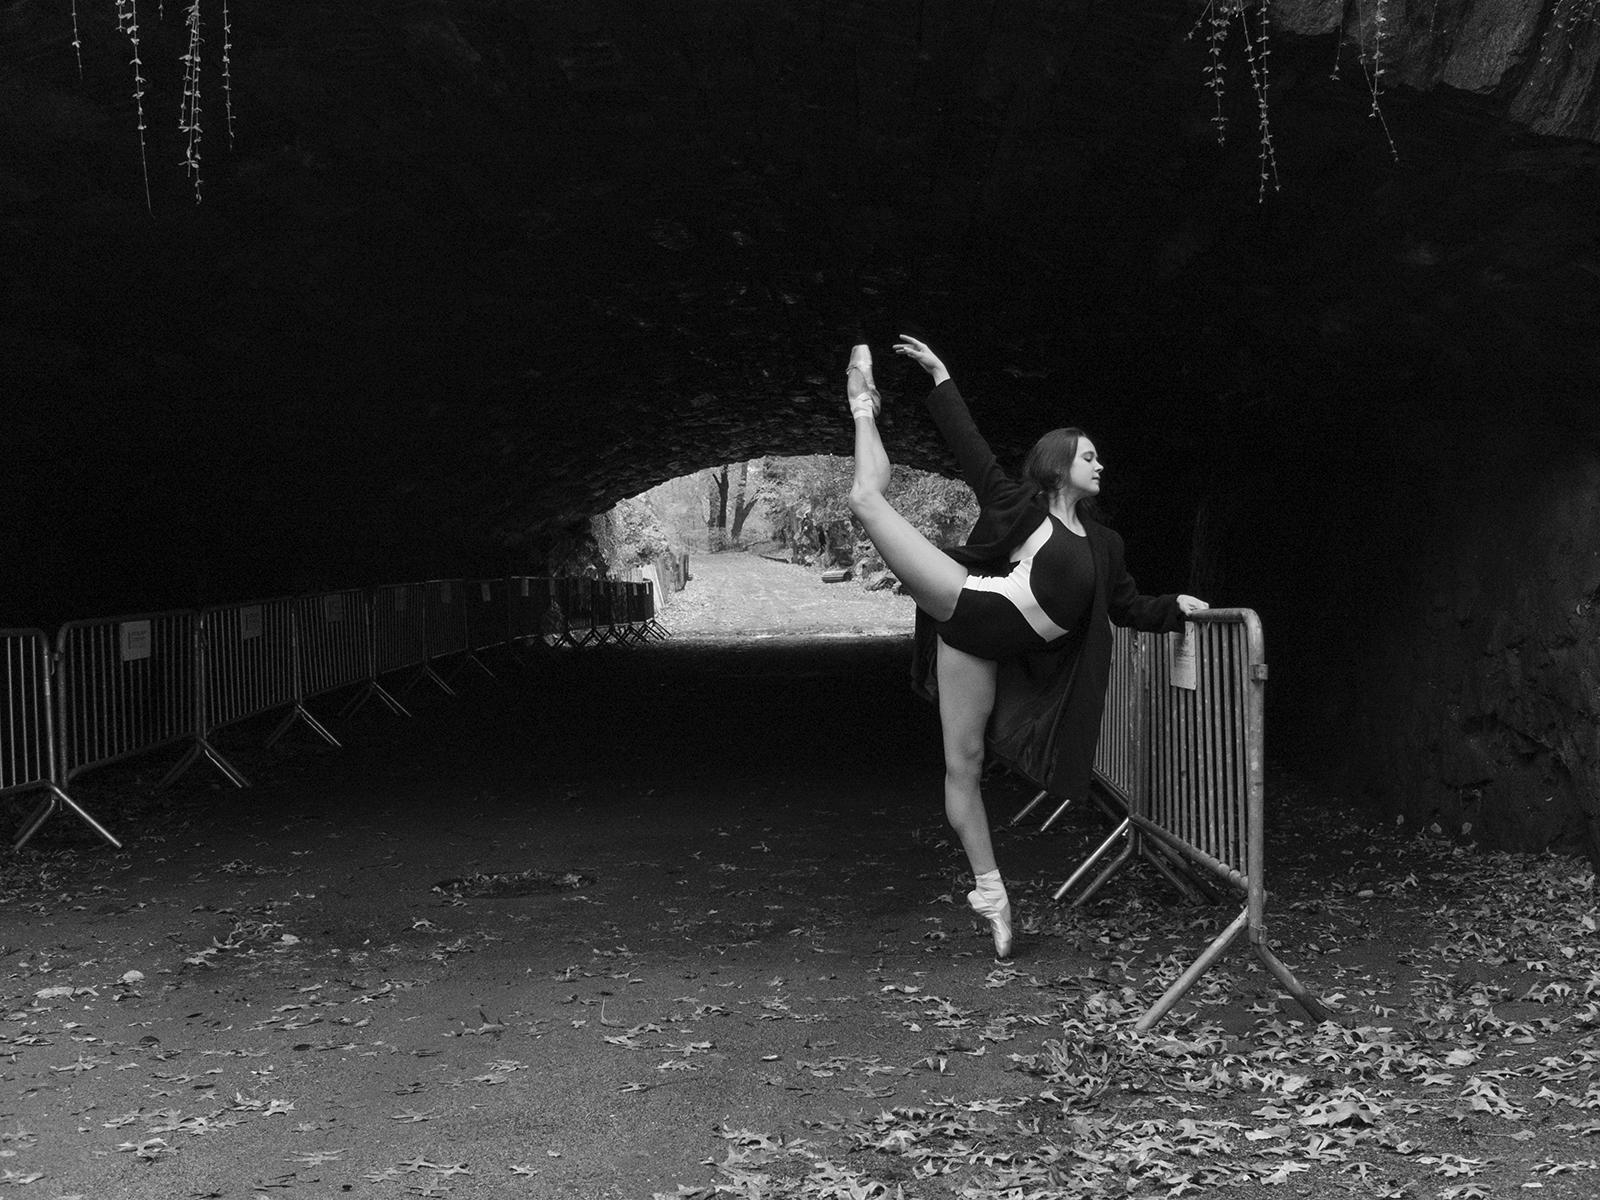 fujifilm-x30, dane-shitagi, ballerina-project, dance-photography, arts, image-samples, fujifilm-us